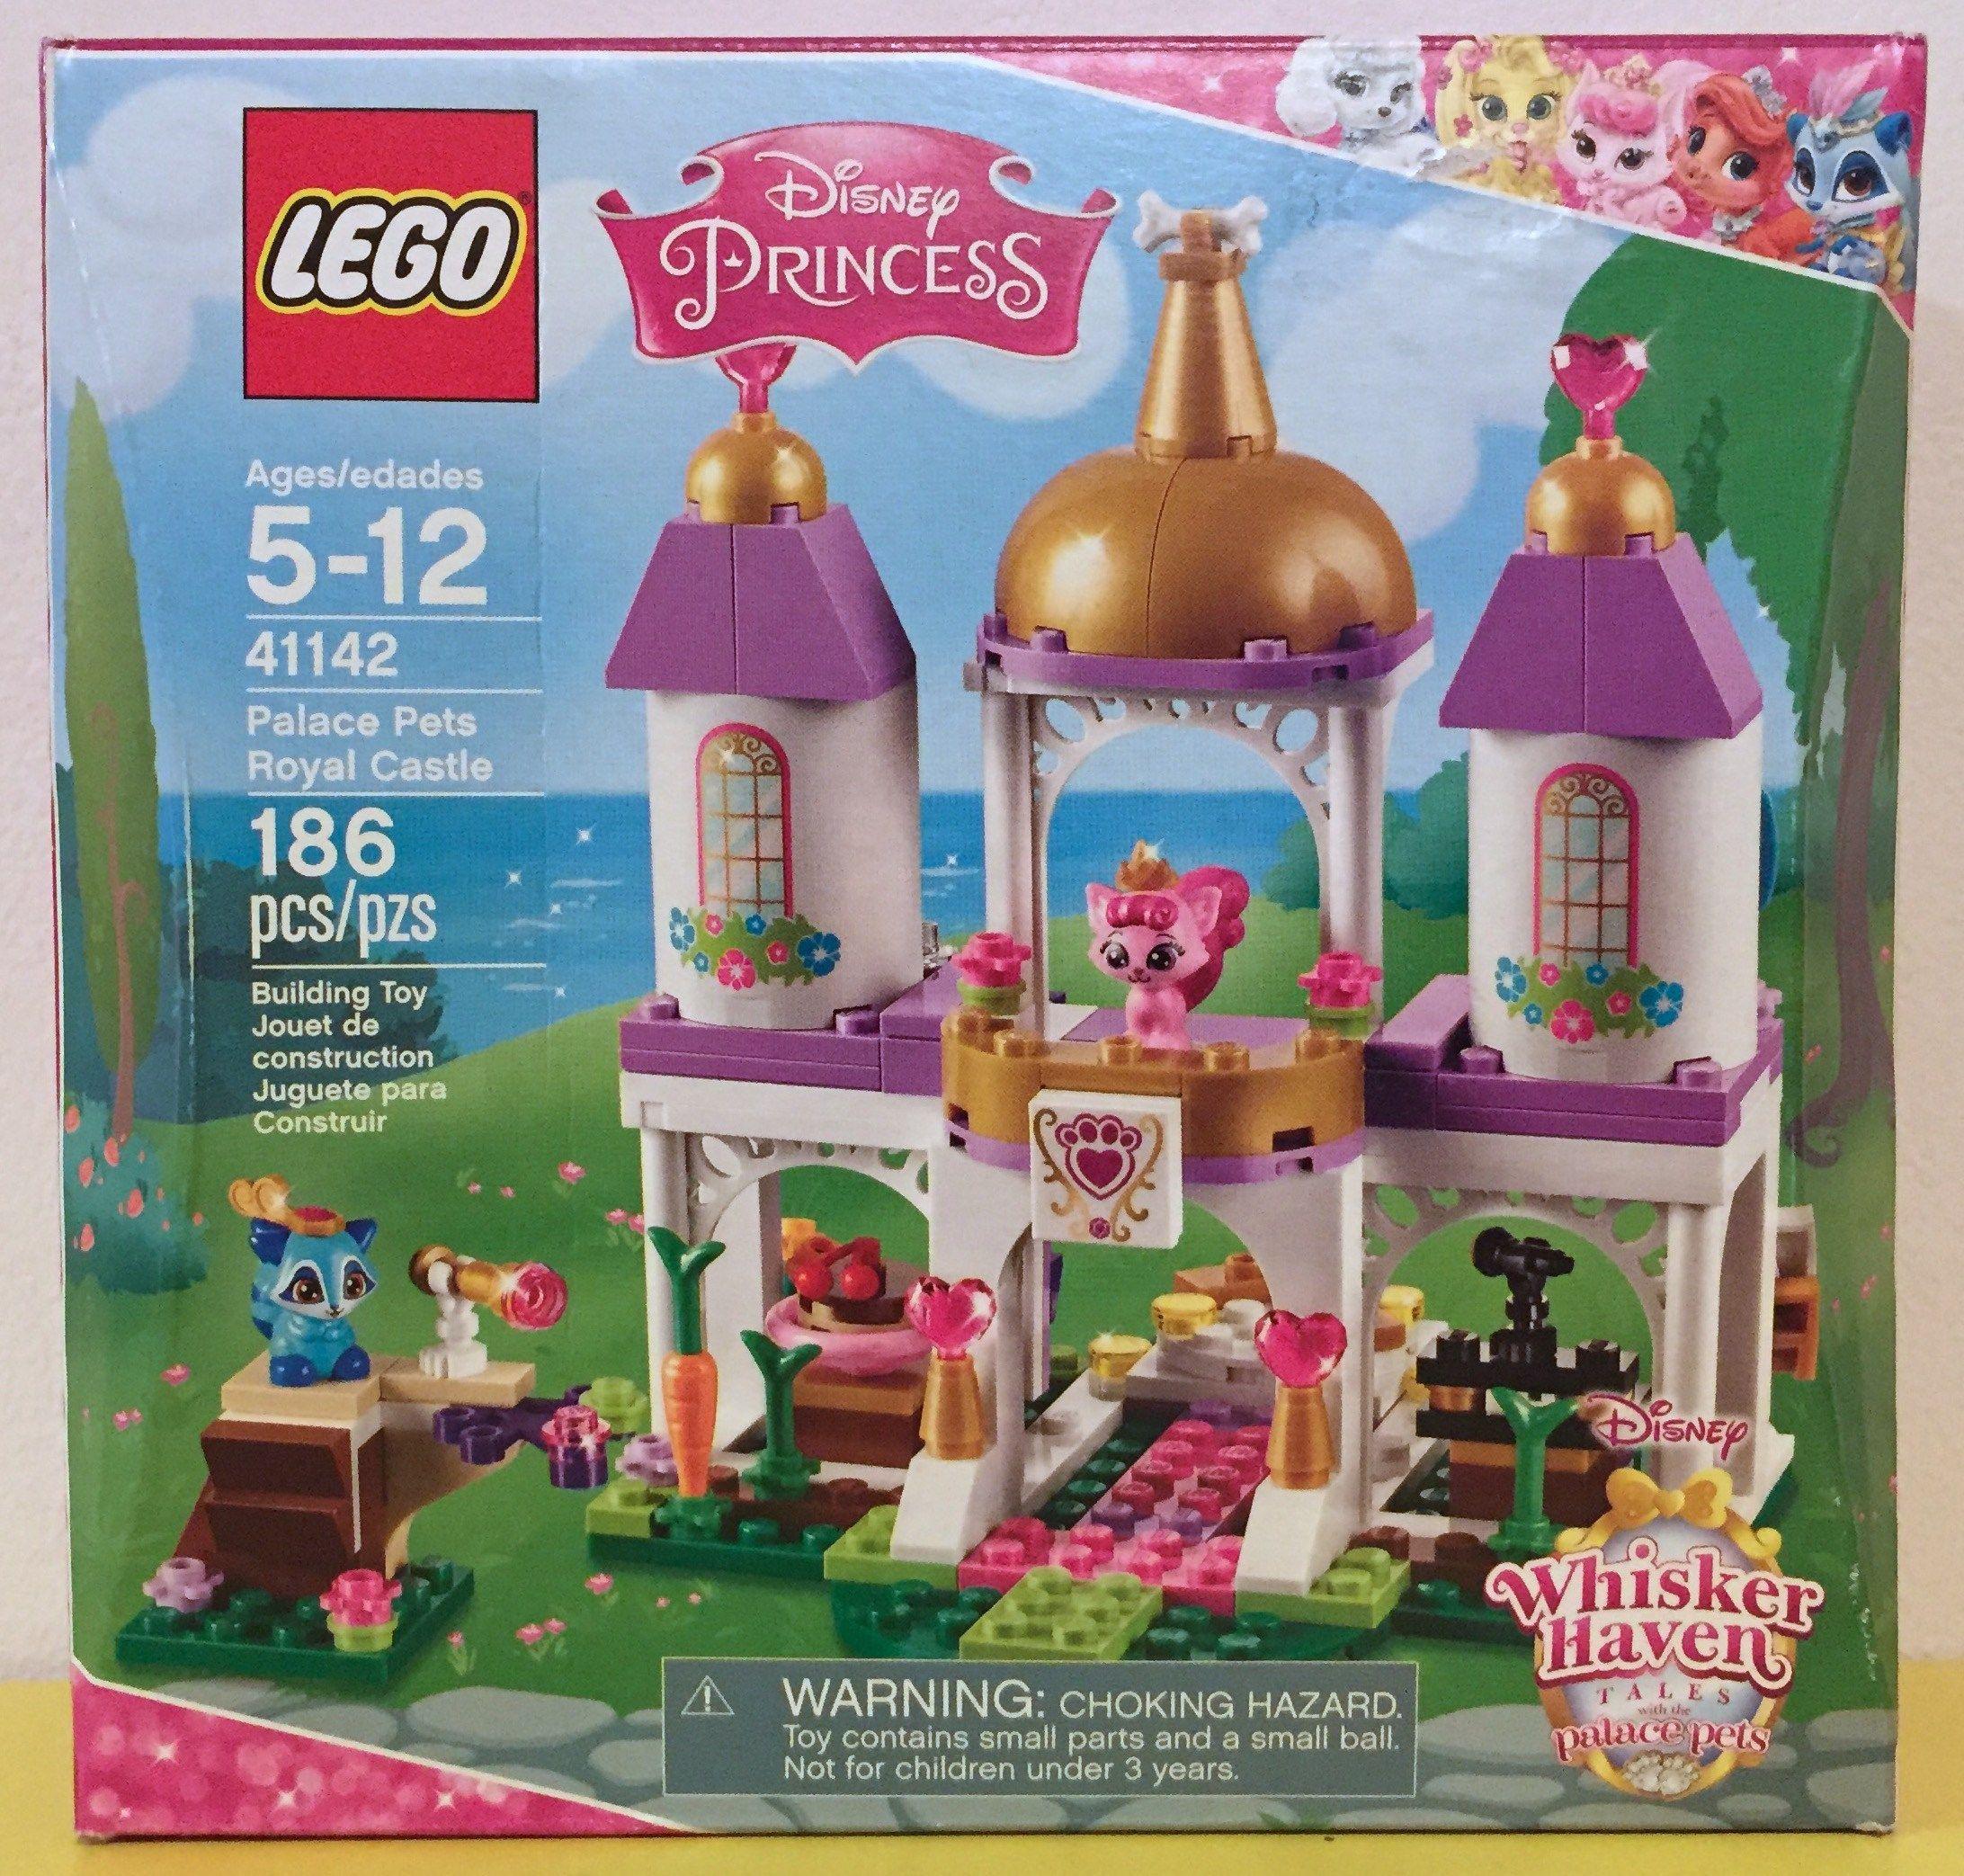 Hugedomains Com Shop For Over 300 000 Premium Domains Lego Disney Princess Palace Pets Disney Princess Palace Pets